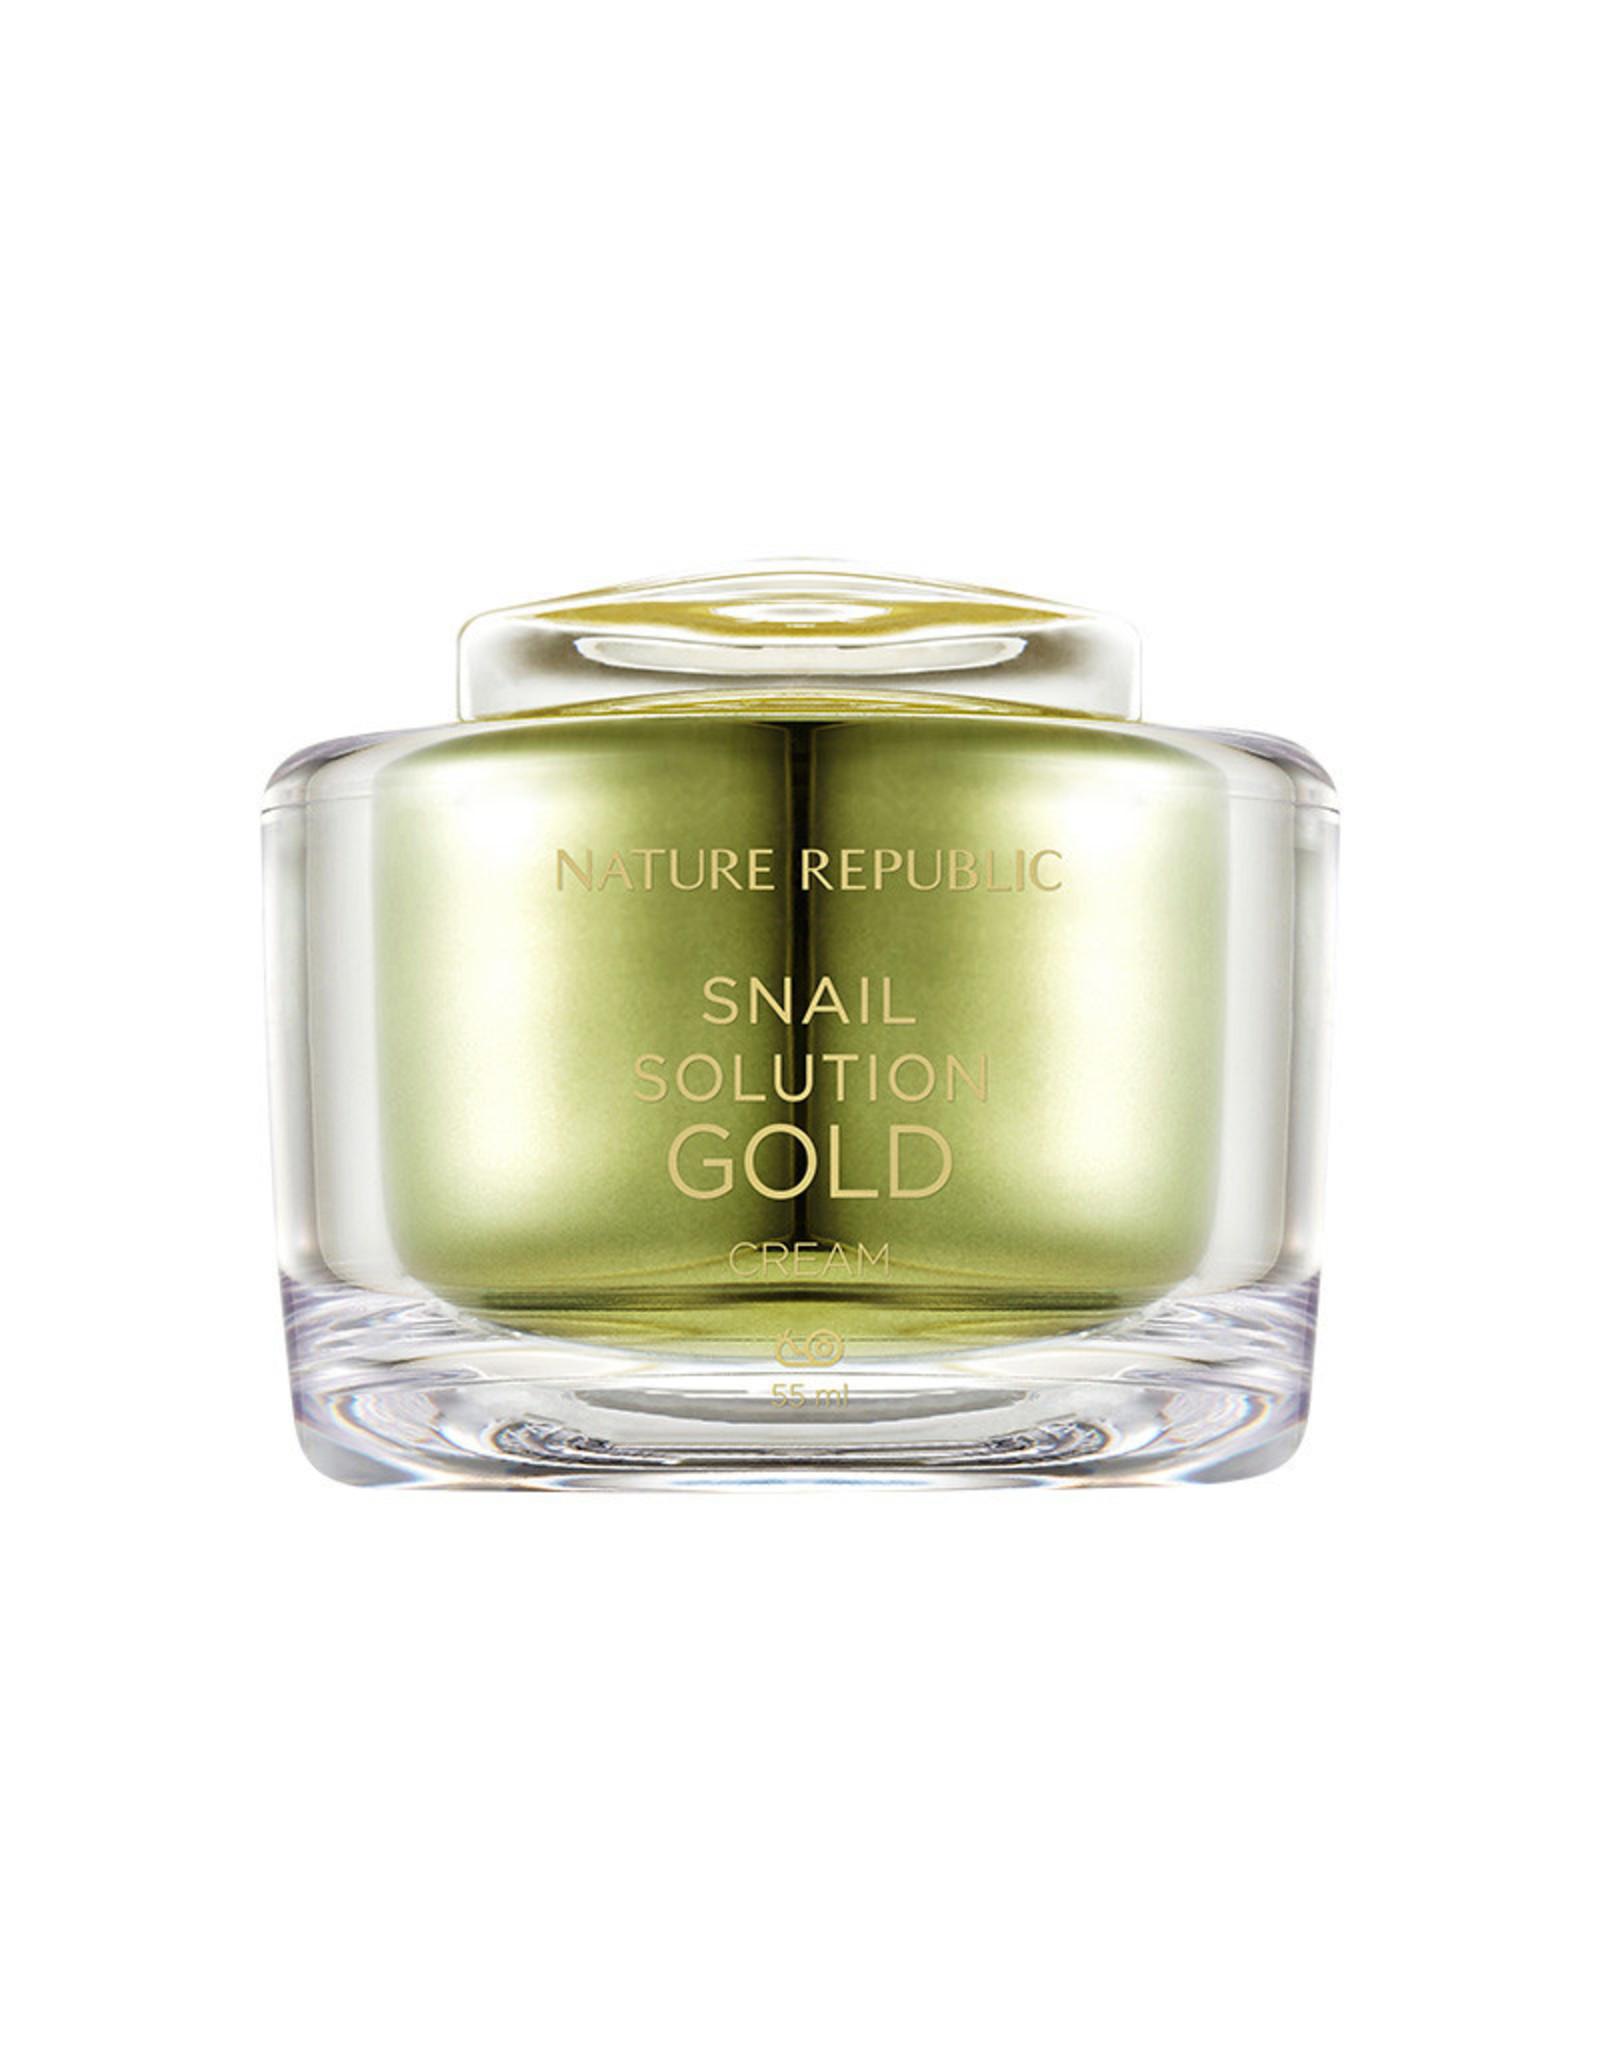 Snail Solution Gold Cream